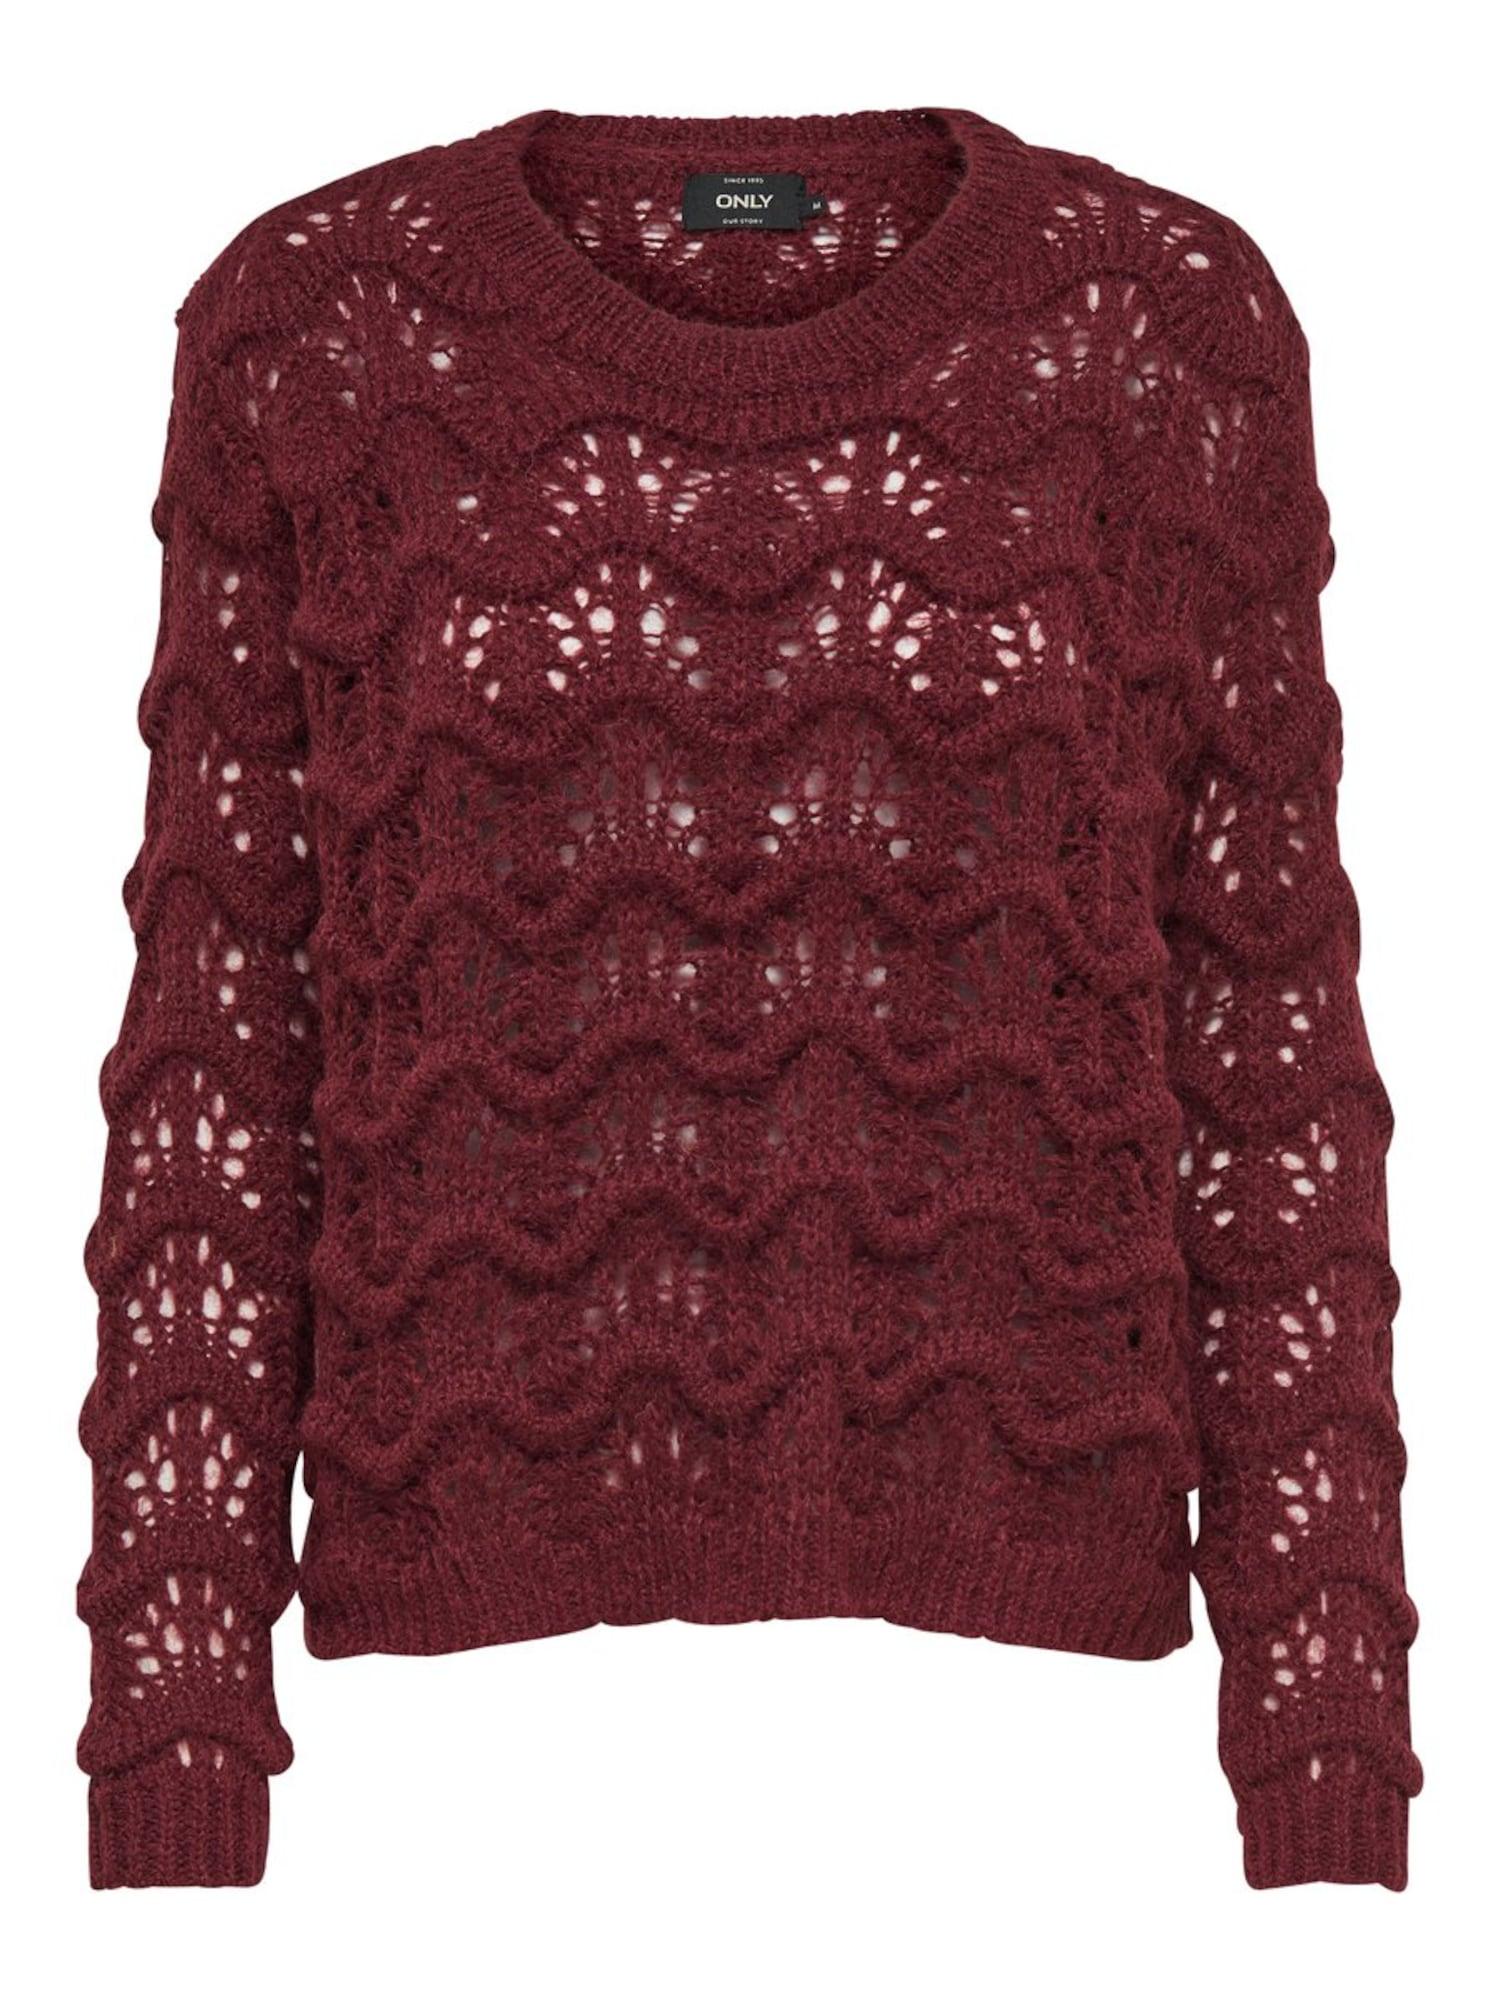 Pullover 'SOLA' | Bekleidung > Pullover > Sonstige Pullover | ONLY